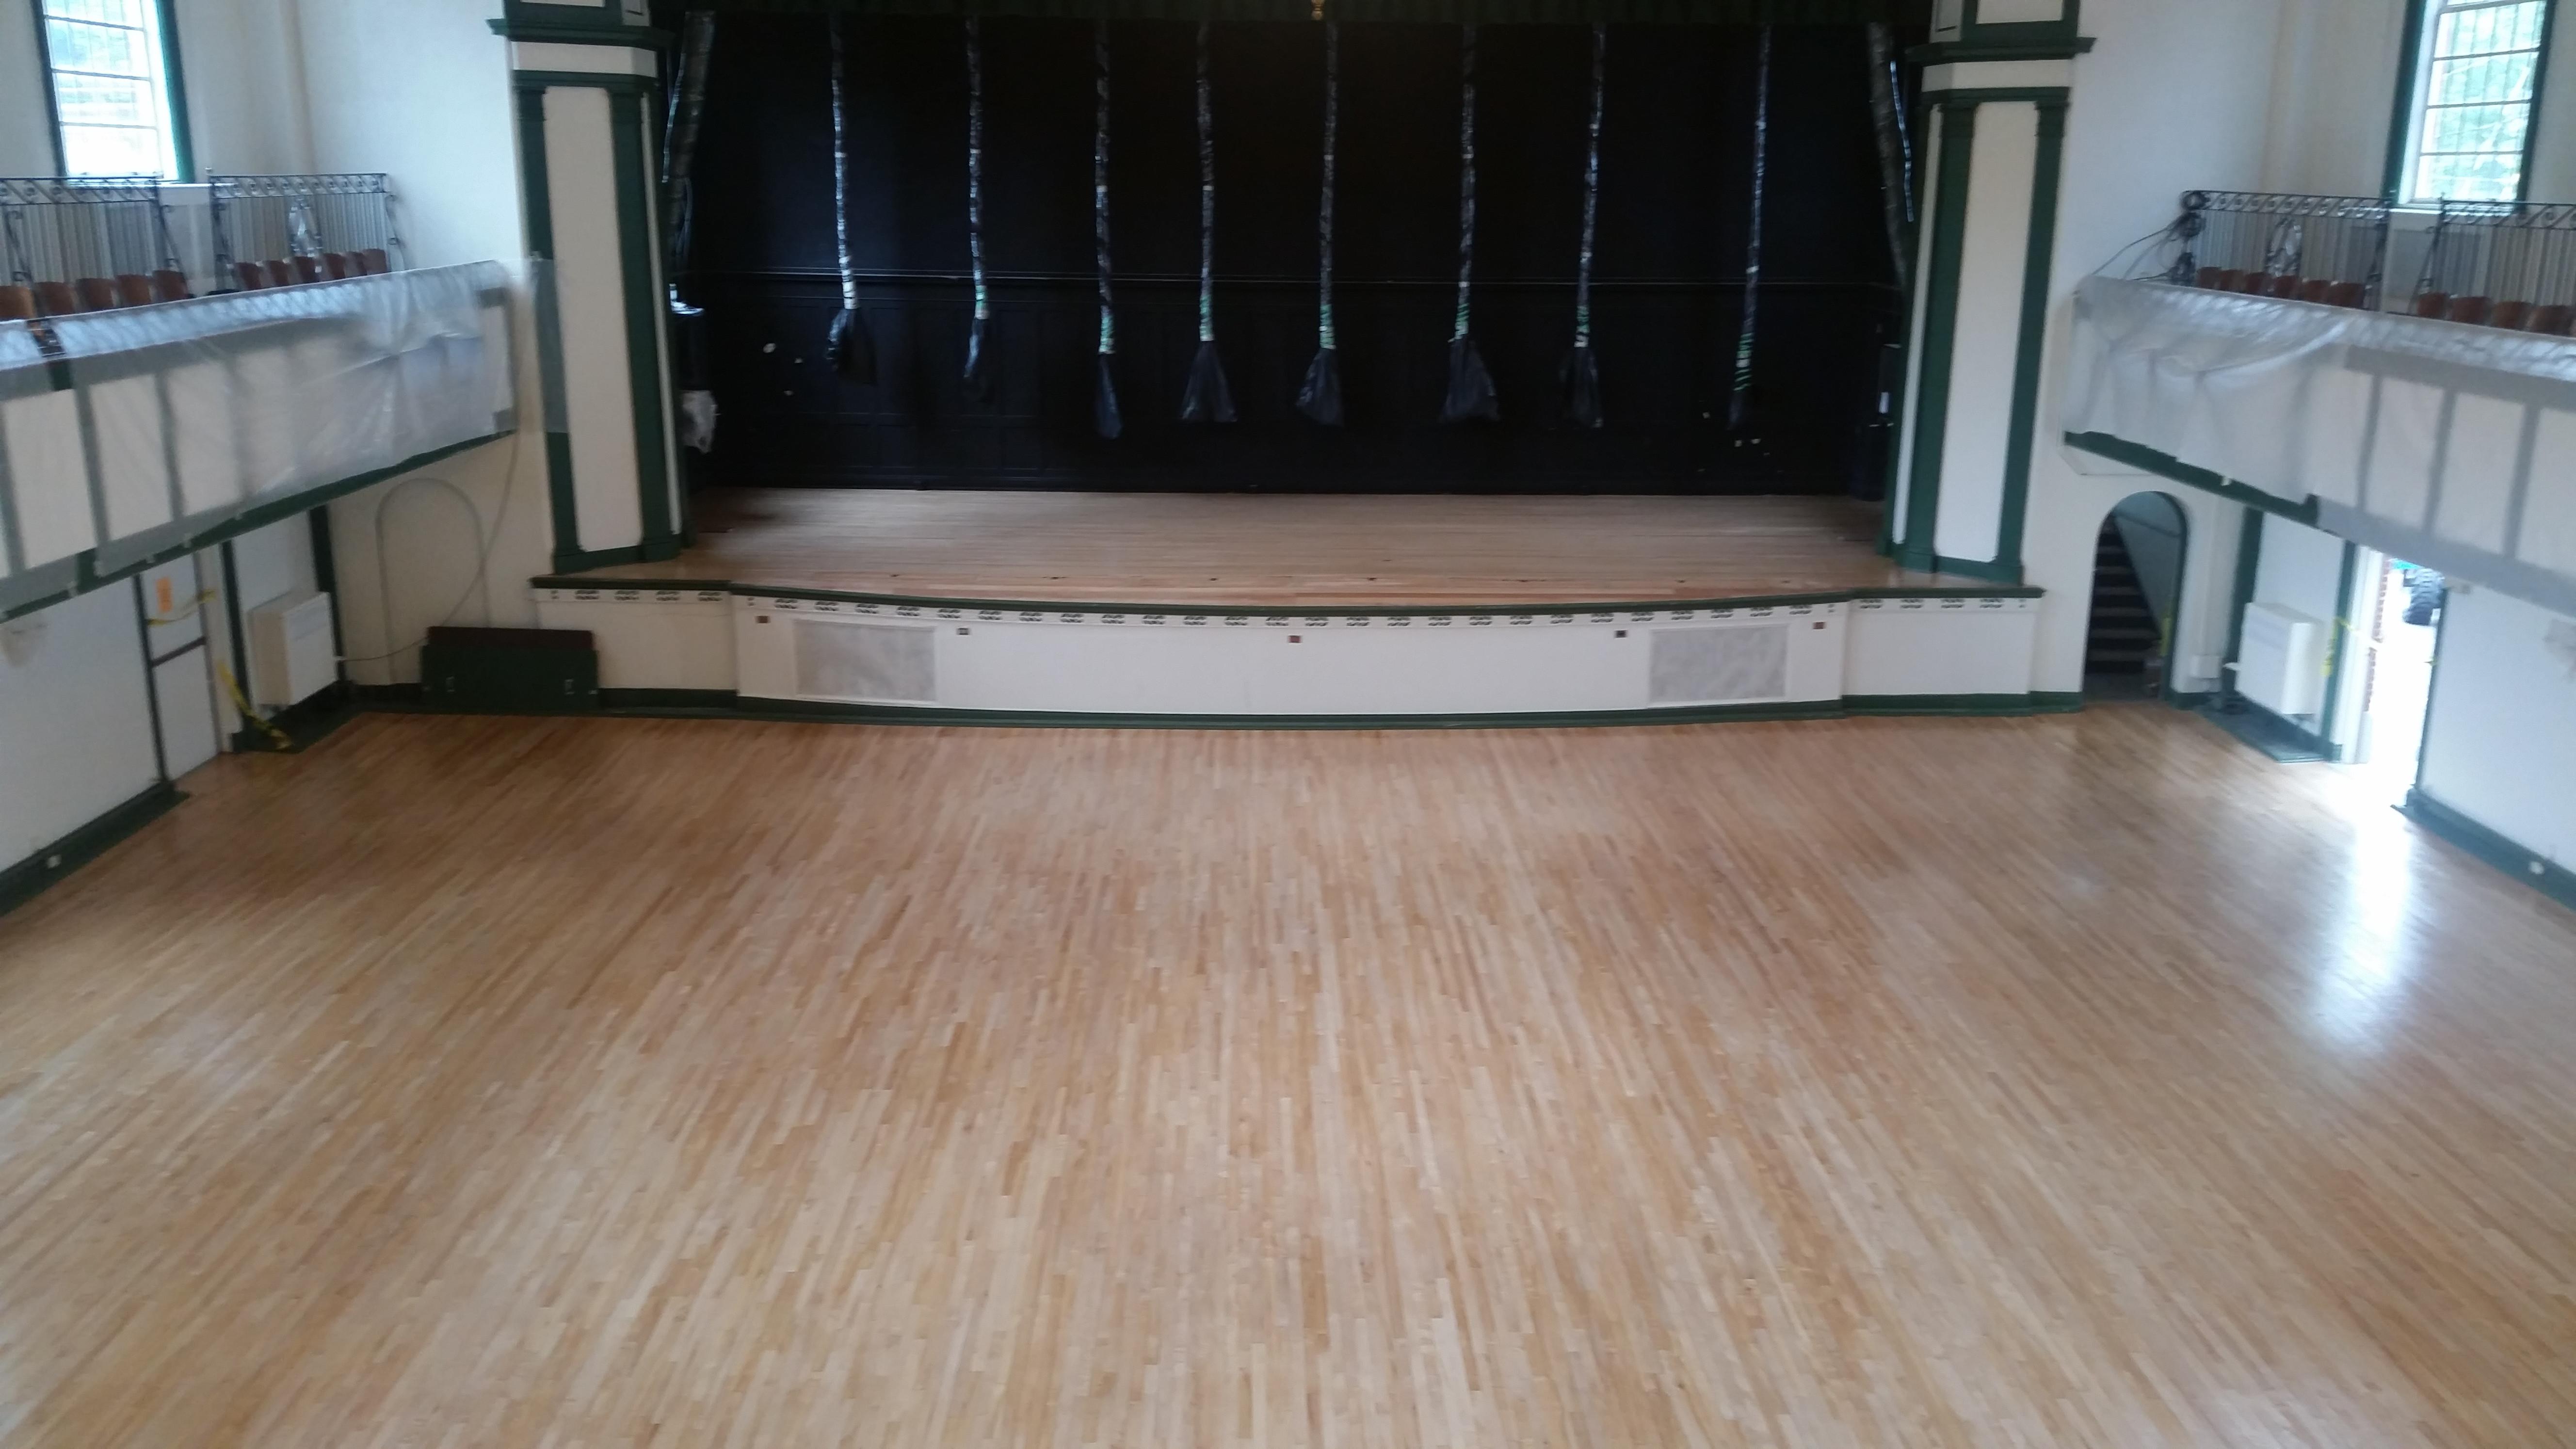 hardwood wood floor installation flooring jack of how to install wood floors rimal jbr family apartment floor inside how to install wood floors rochester hardwood floors of utica home